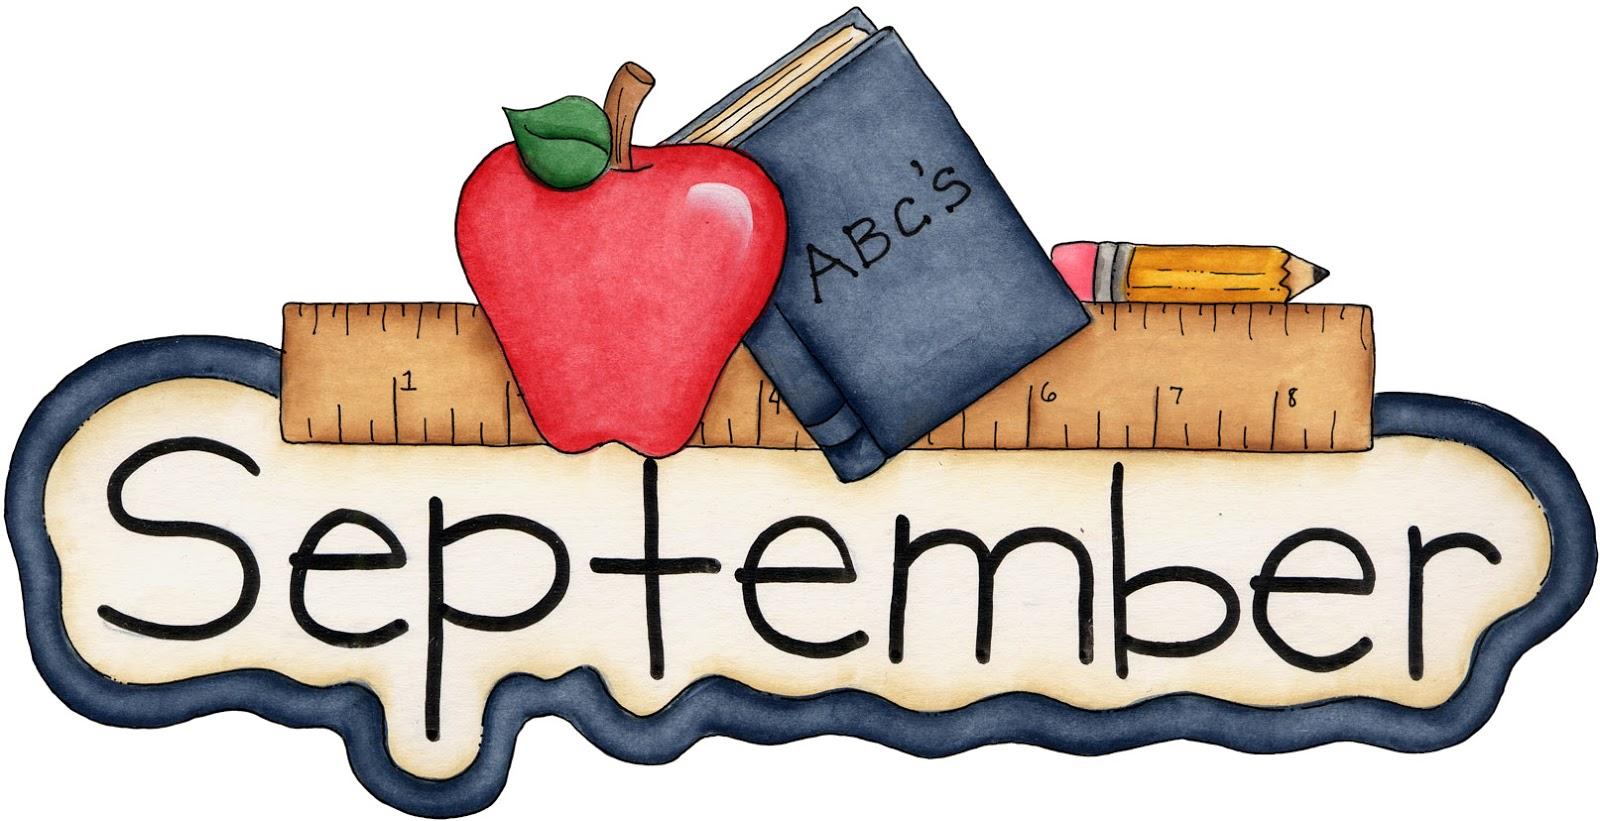 September calendar 2018 clipart picture royalty free download Free September Cliparts, Download Free Clip Art, Free Clip Art on ... picture royalty free download